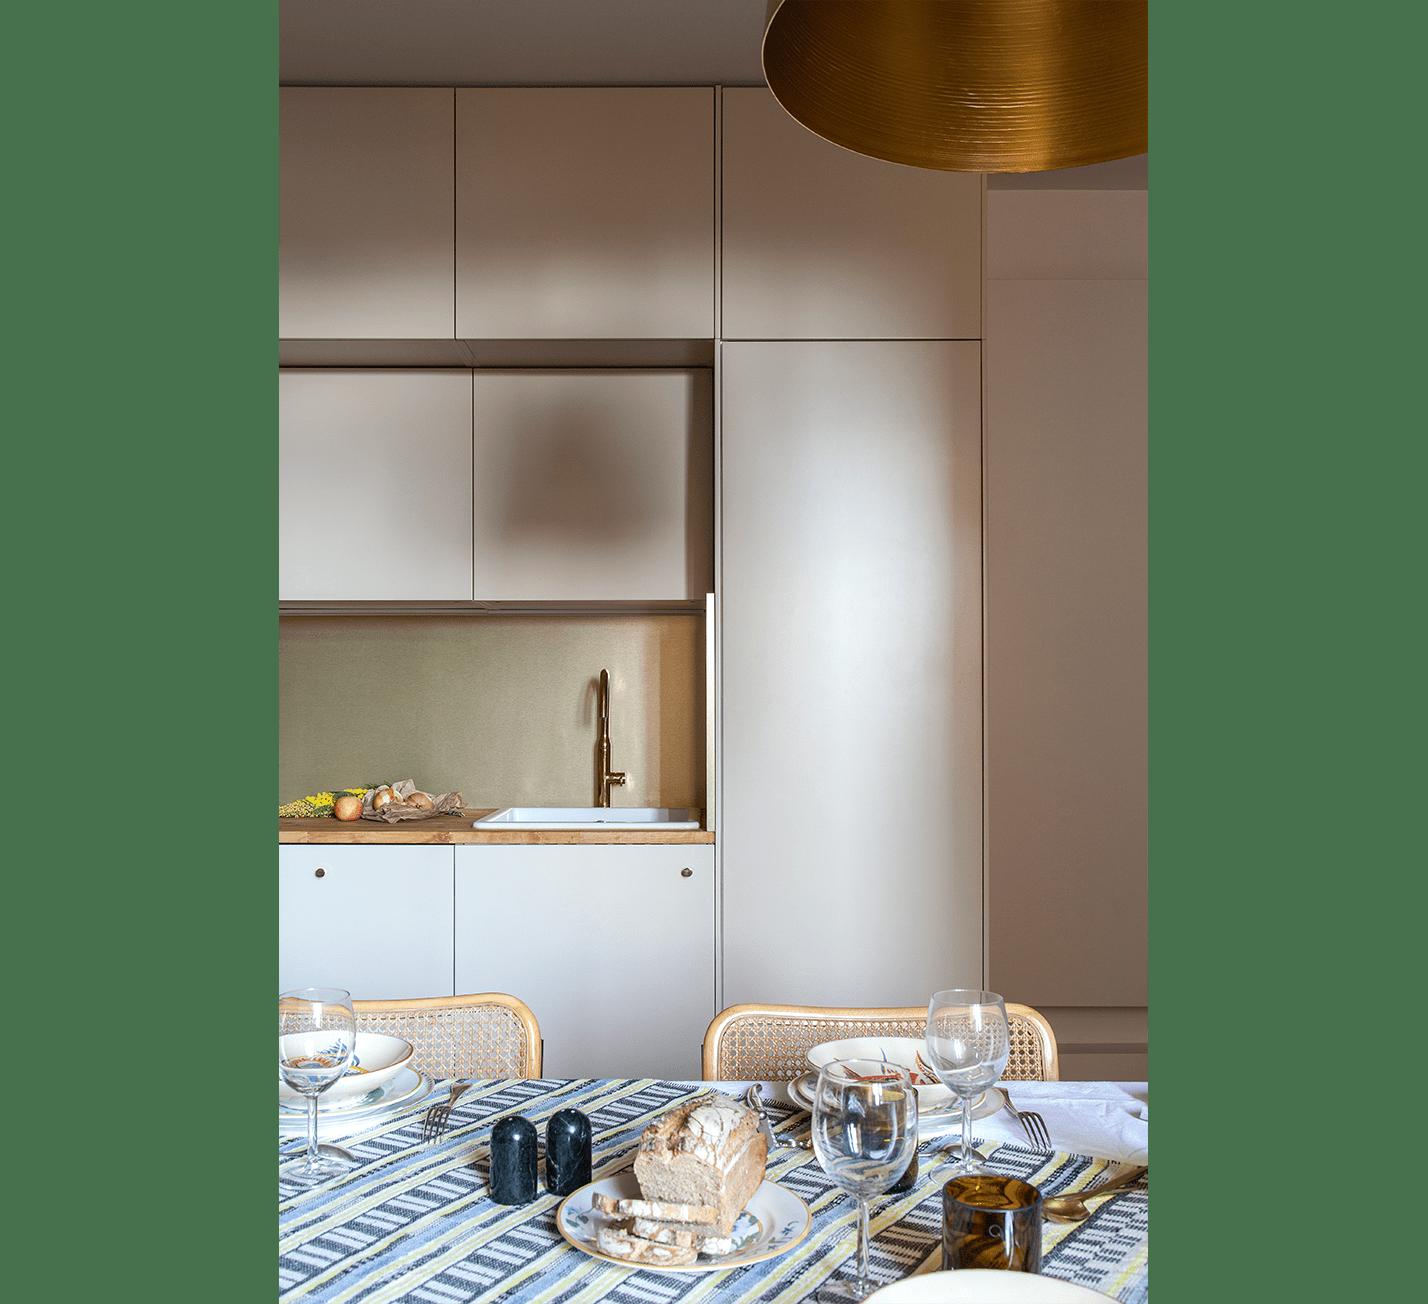 Projet-Alfred-Atelier-Steve-Pauline-Borgia-Architecture-interieur-06-min-1